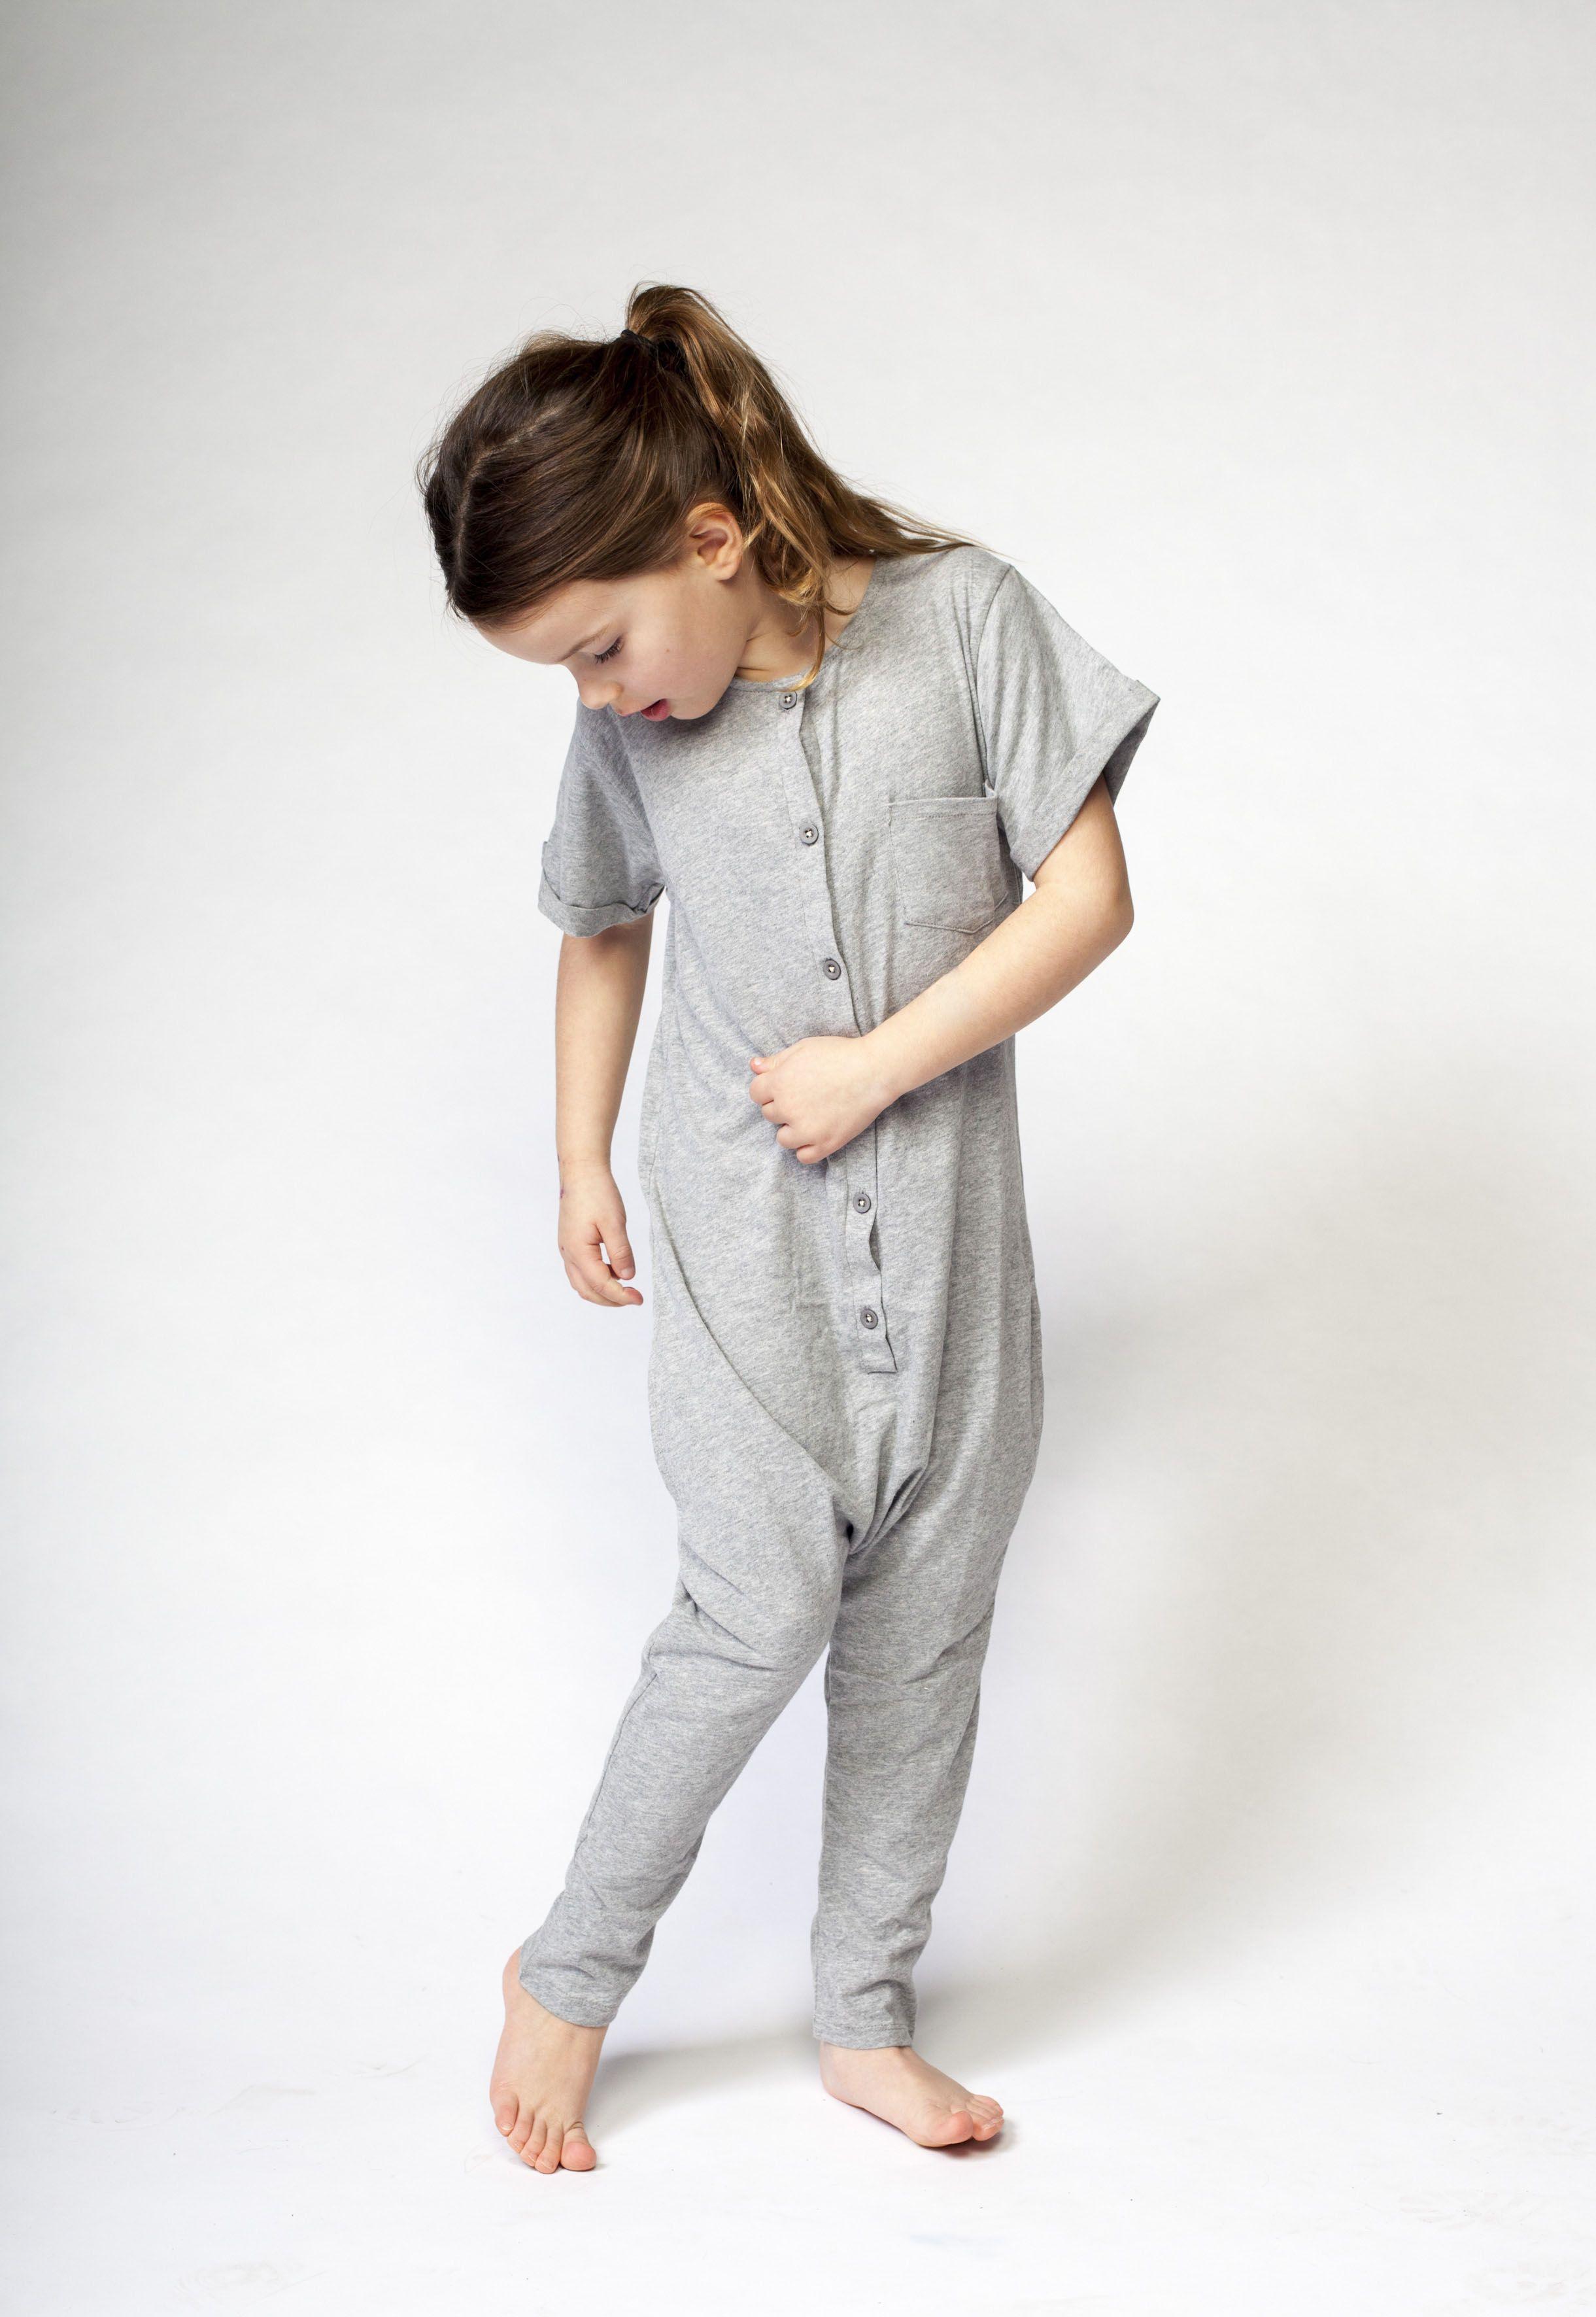 Kinderkleding Webshop.Yuna In Summer Suit Kids Children Kinderen Kinderkleding